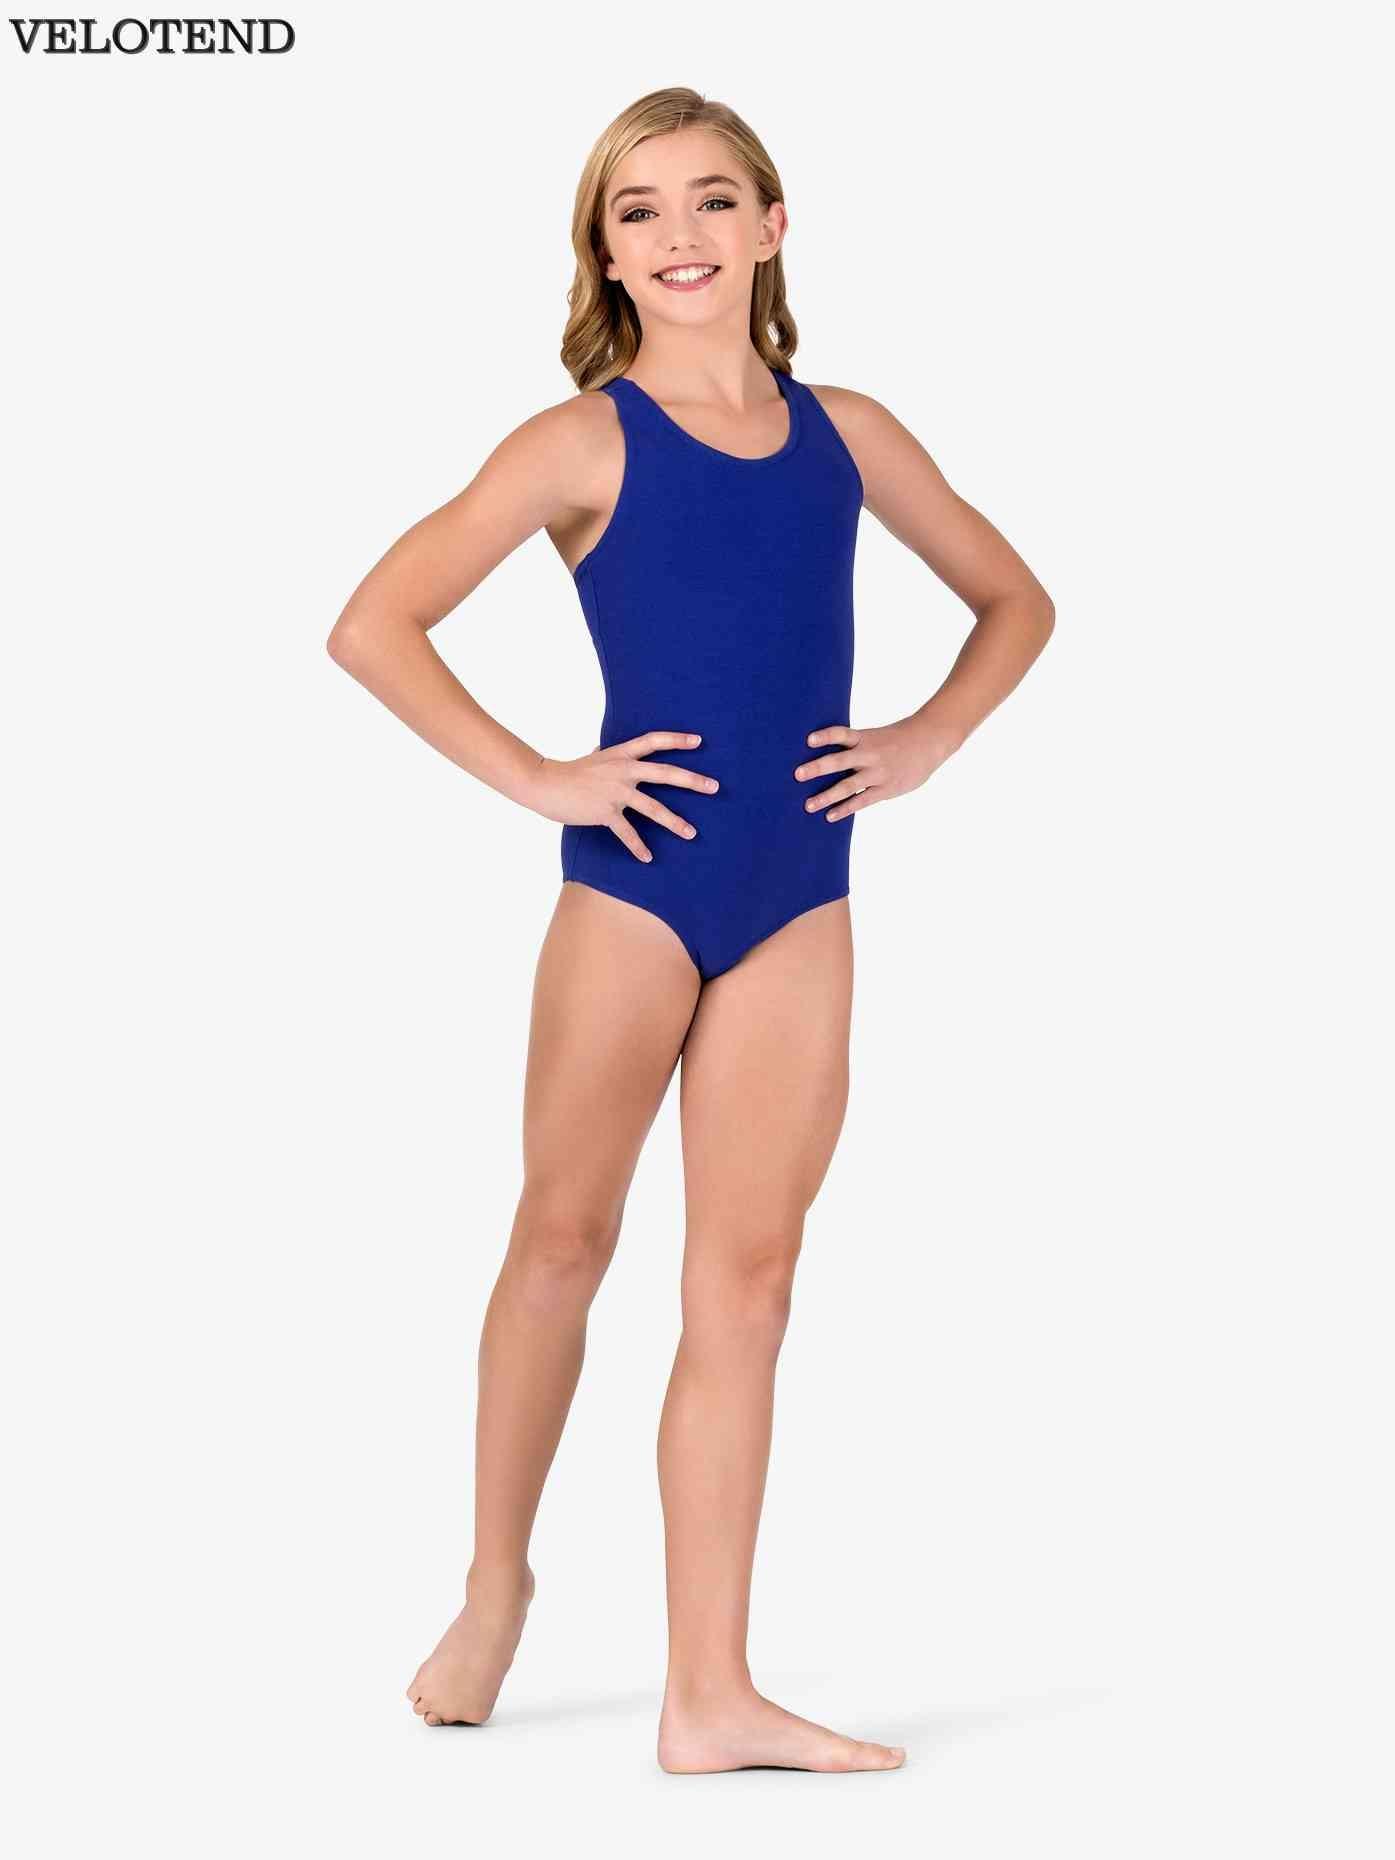 0f96db182 VELOTEND Girls Spandex Racerback Tank Shorty Unitard Dancewear for ...